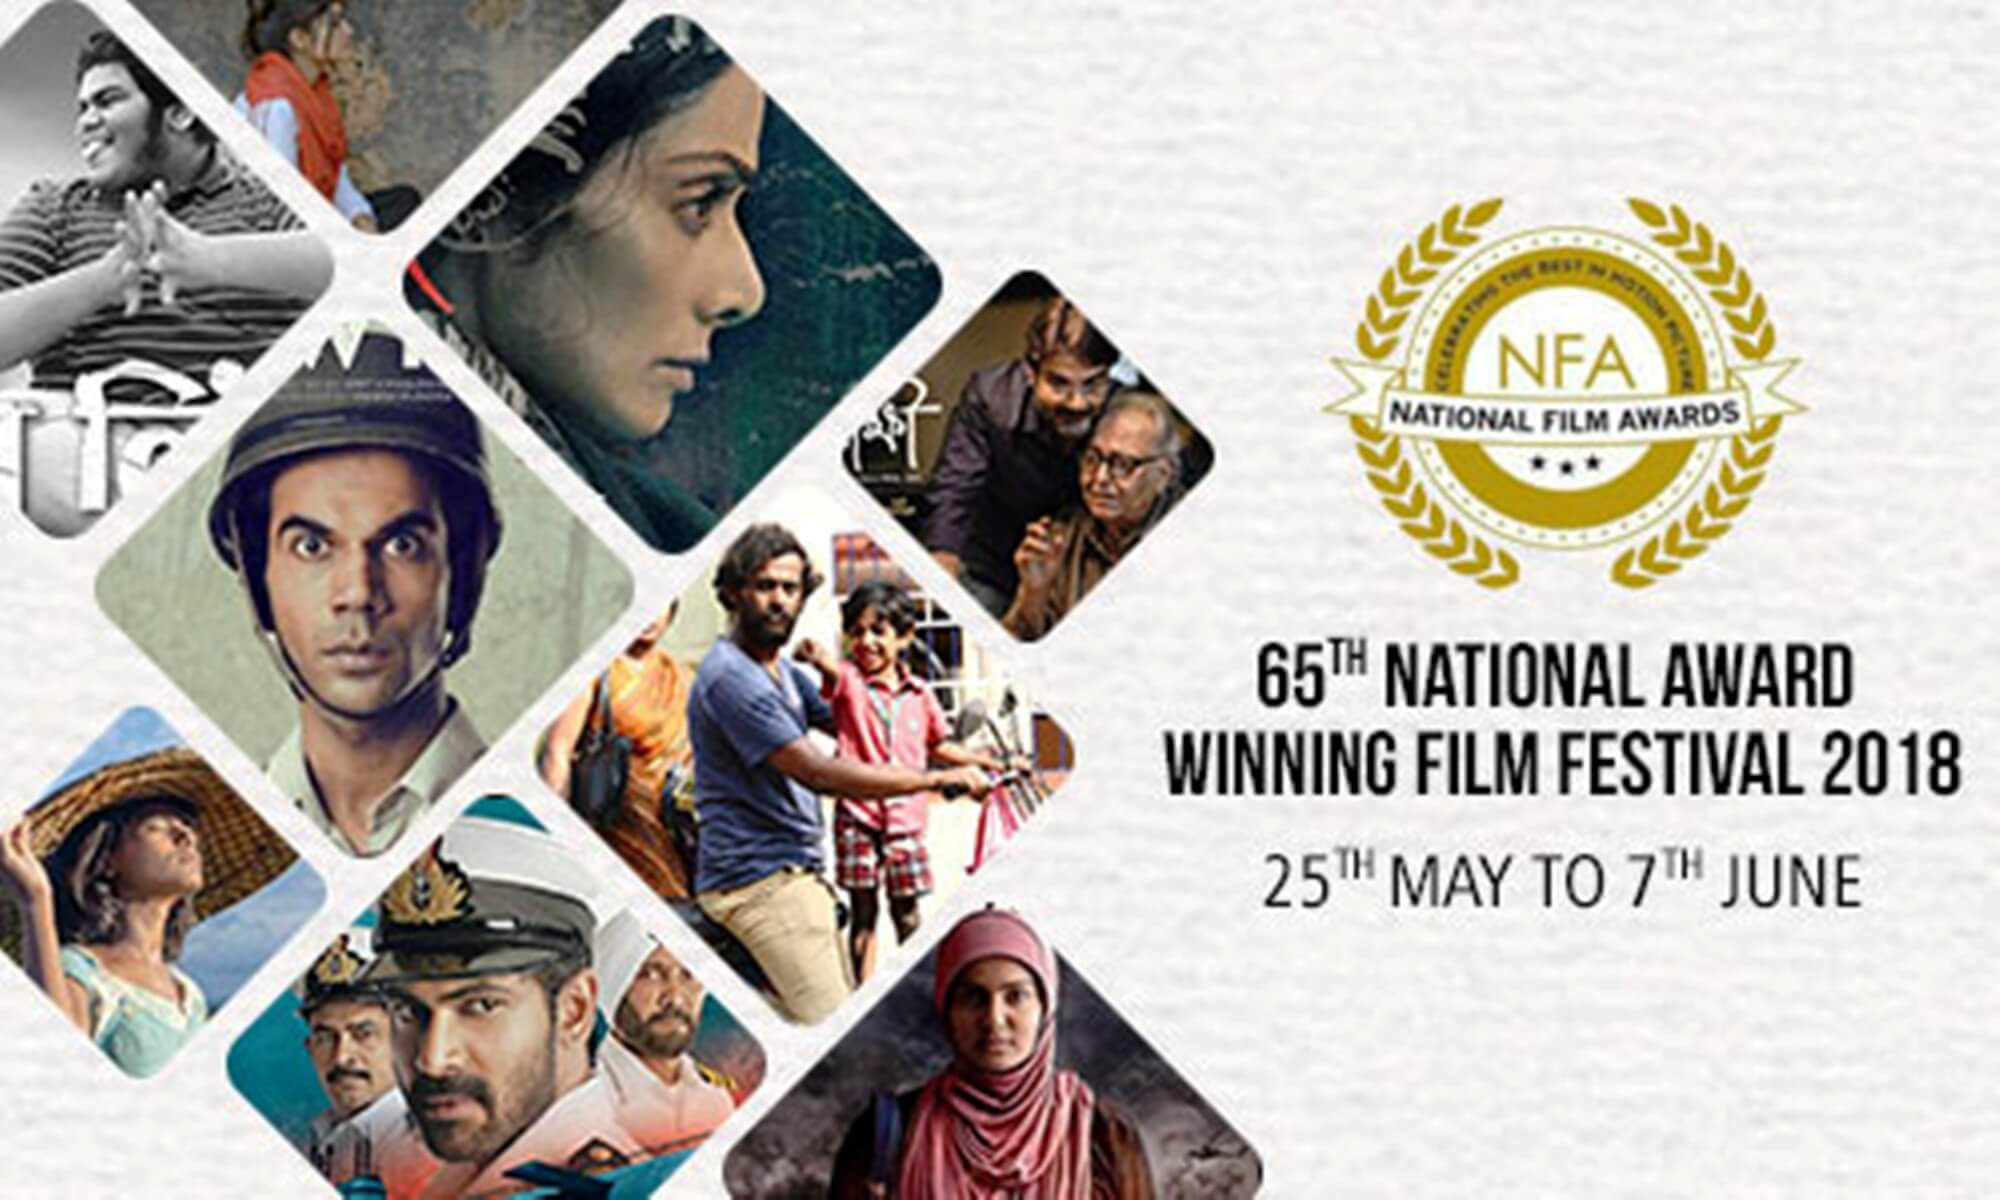 National Award Winning Films Festival 2018